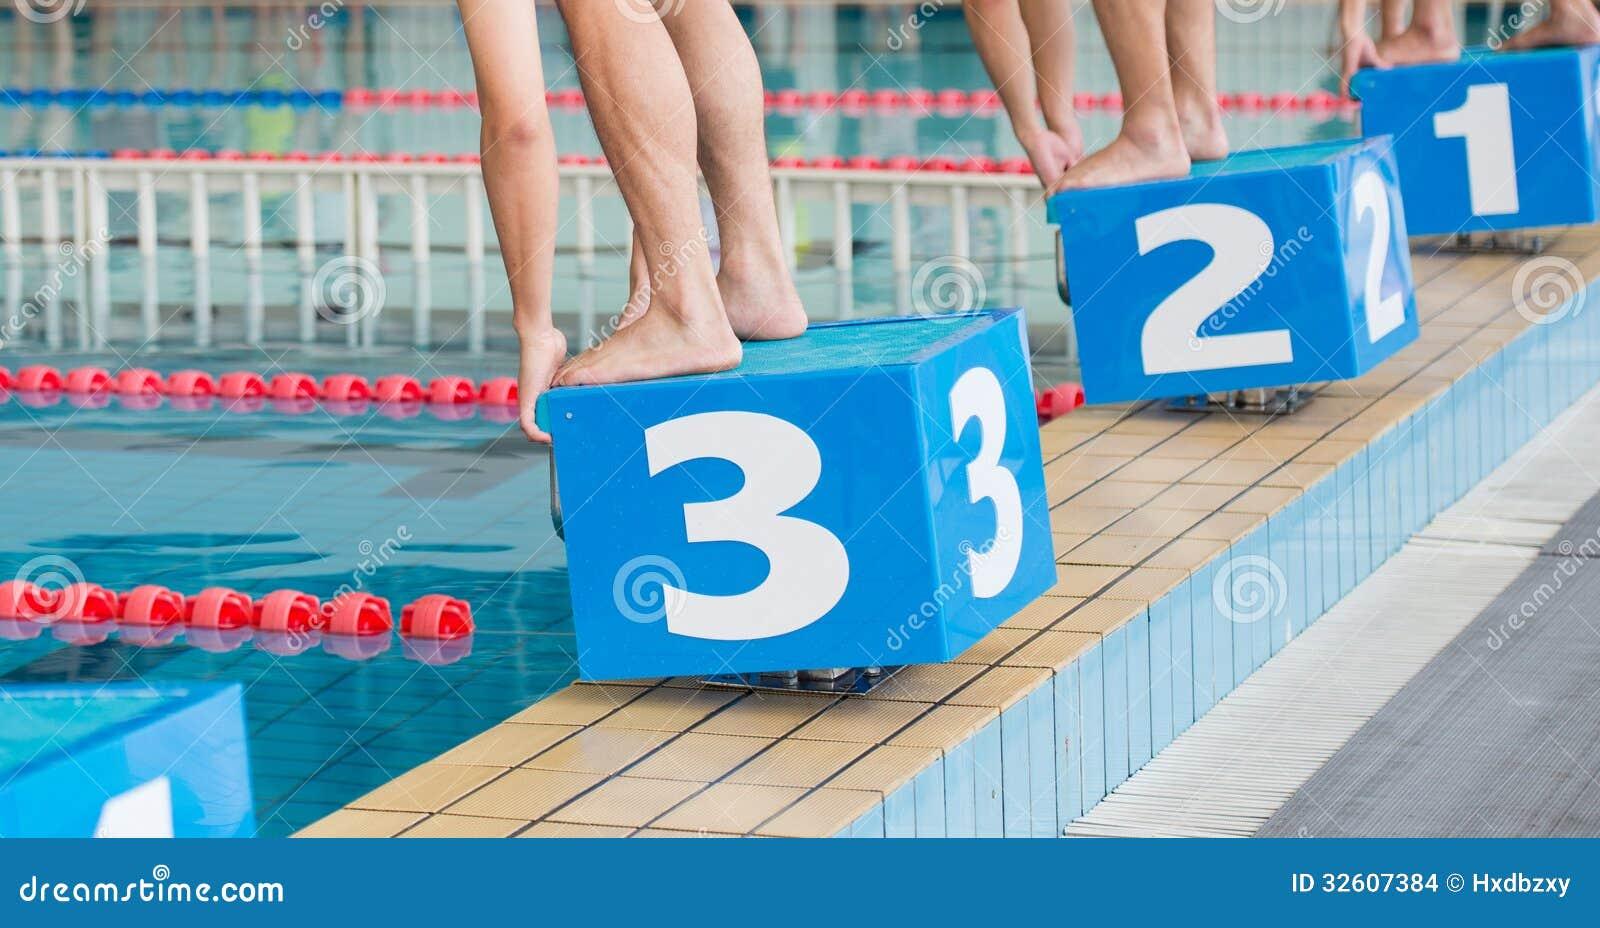 Pool Game Download 2d Pool Pandametr